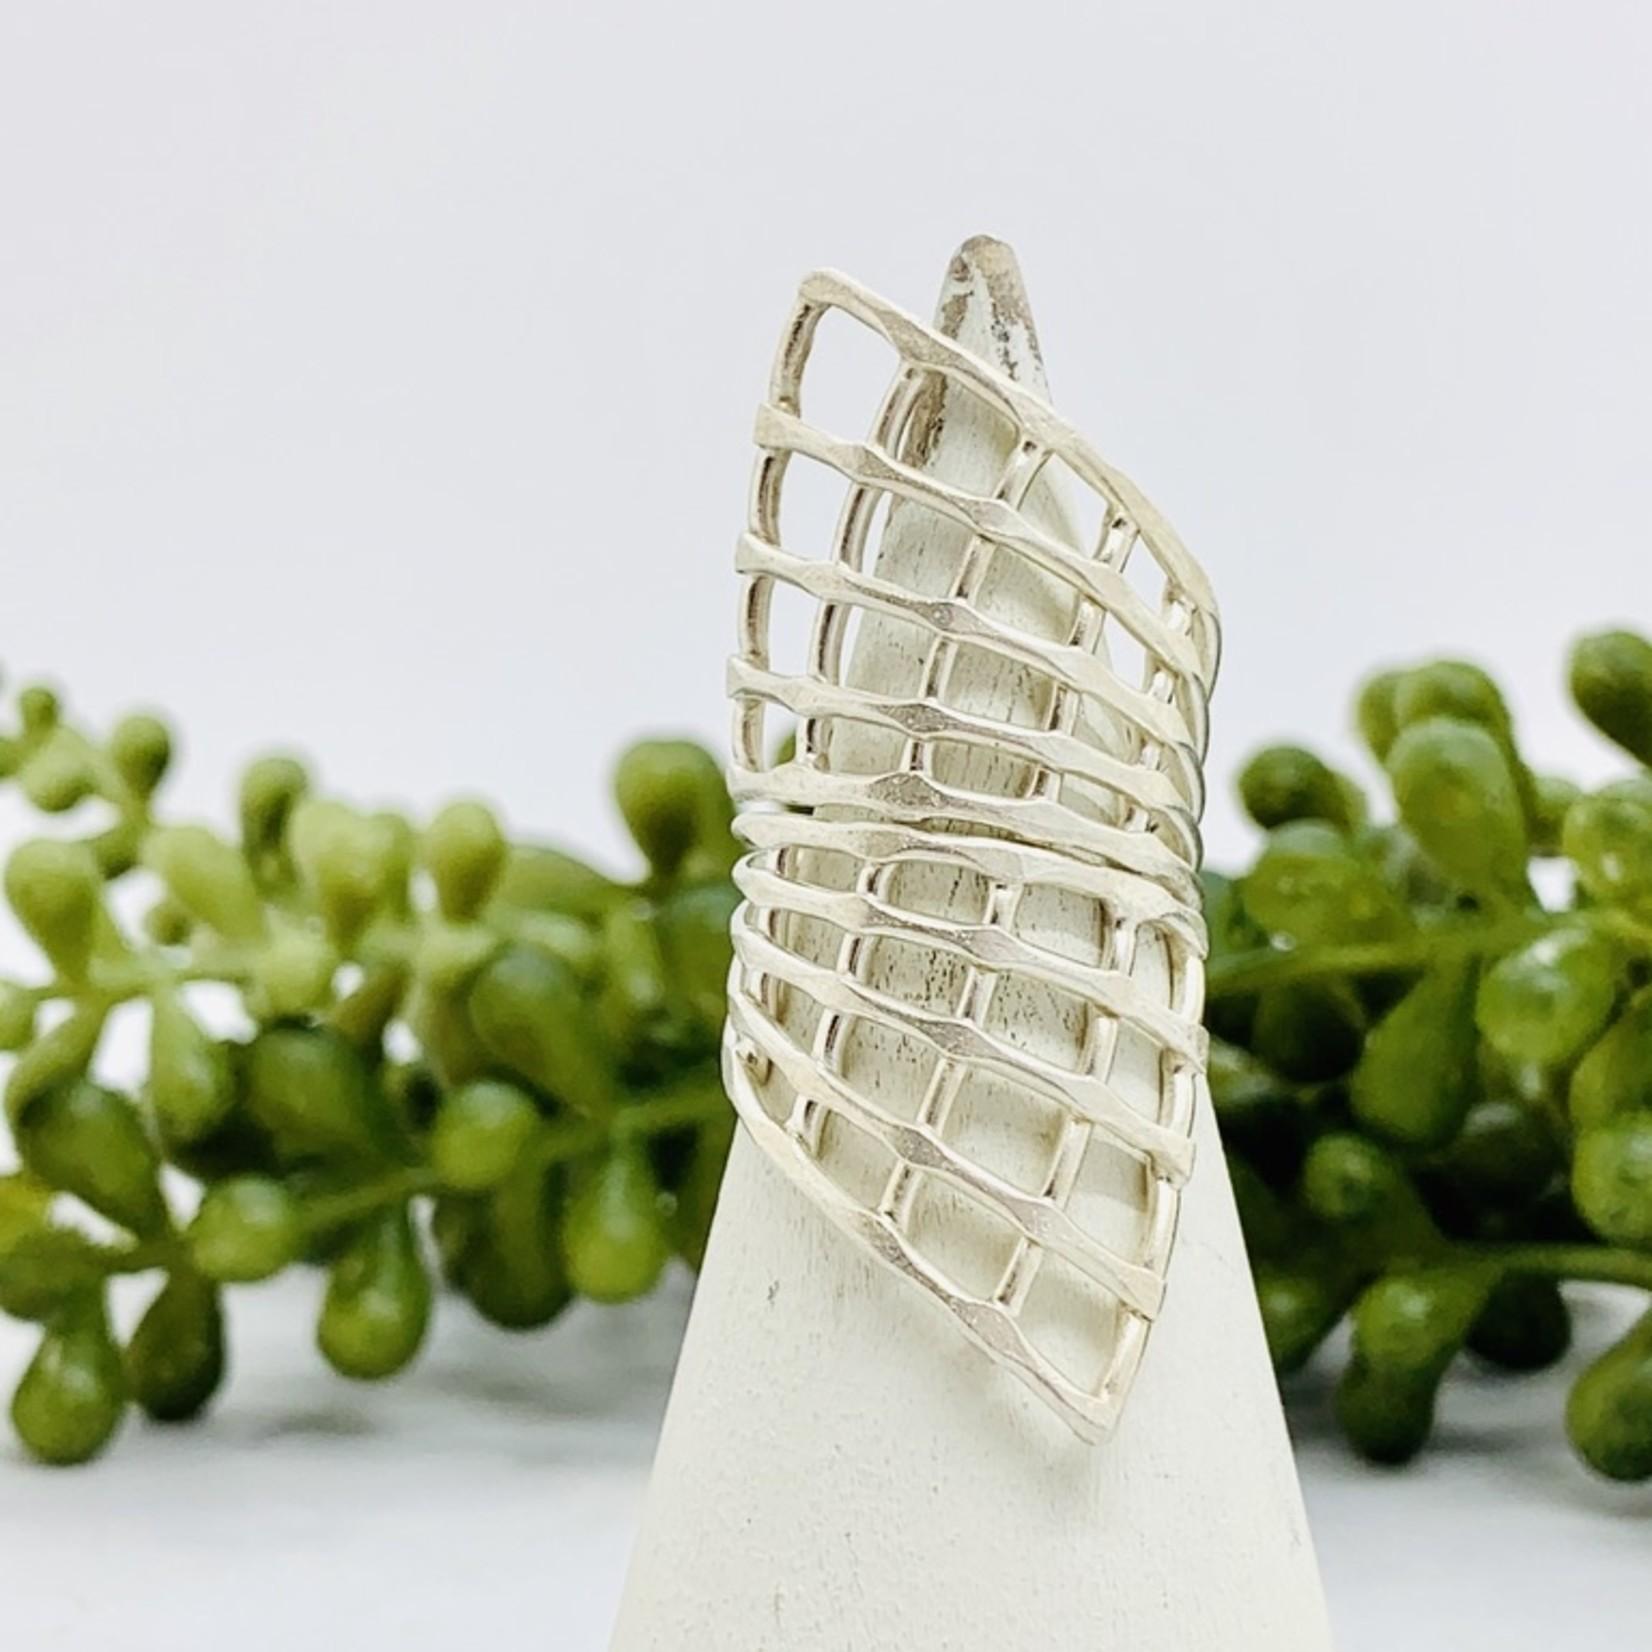 Anantara Silver Cage Wrap Ring